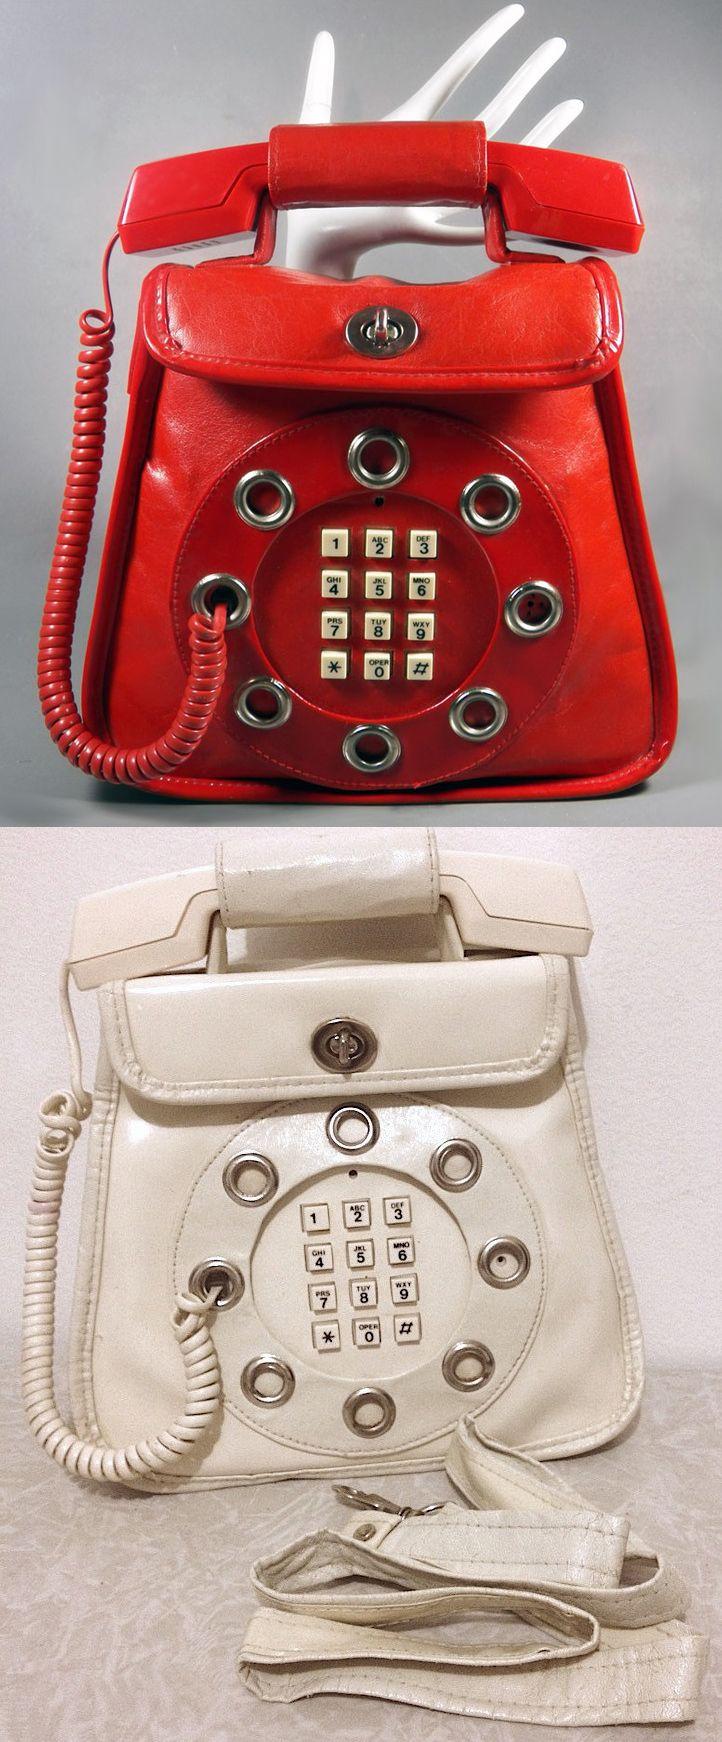 Working Telephone Purses by Dallas Handbags